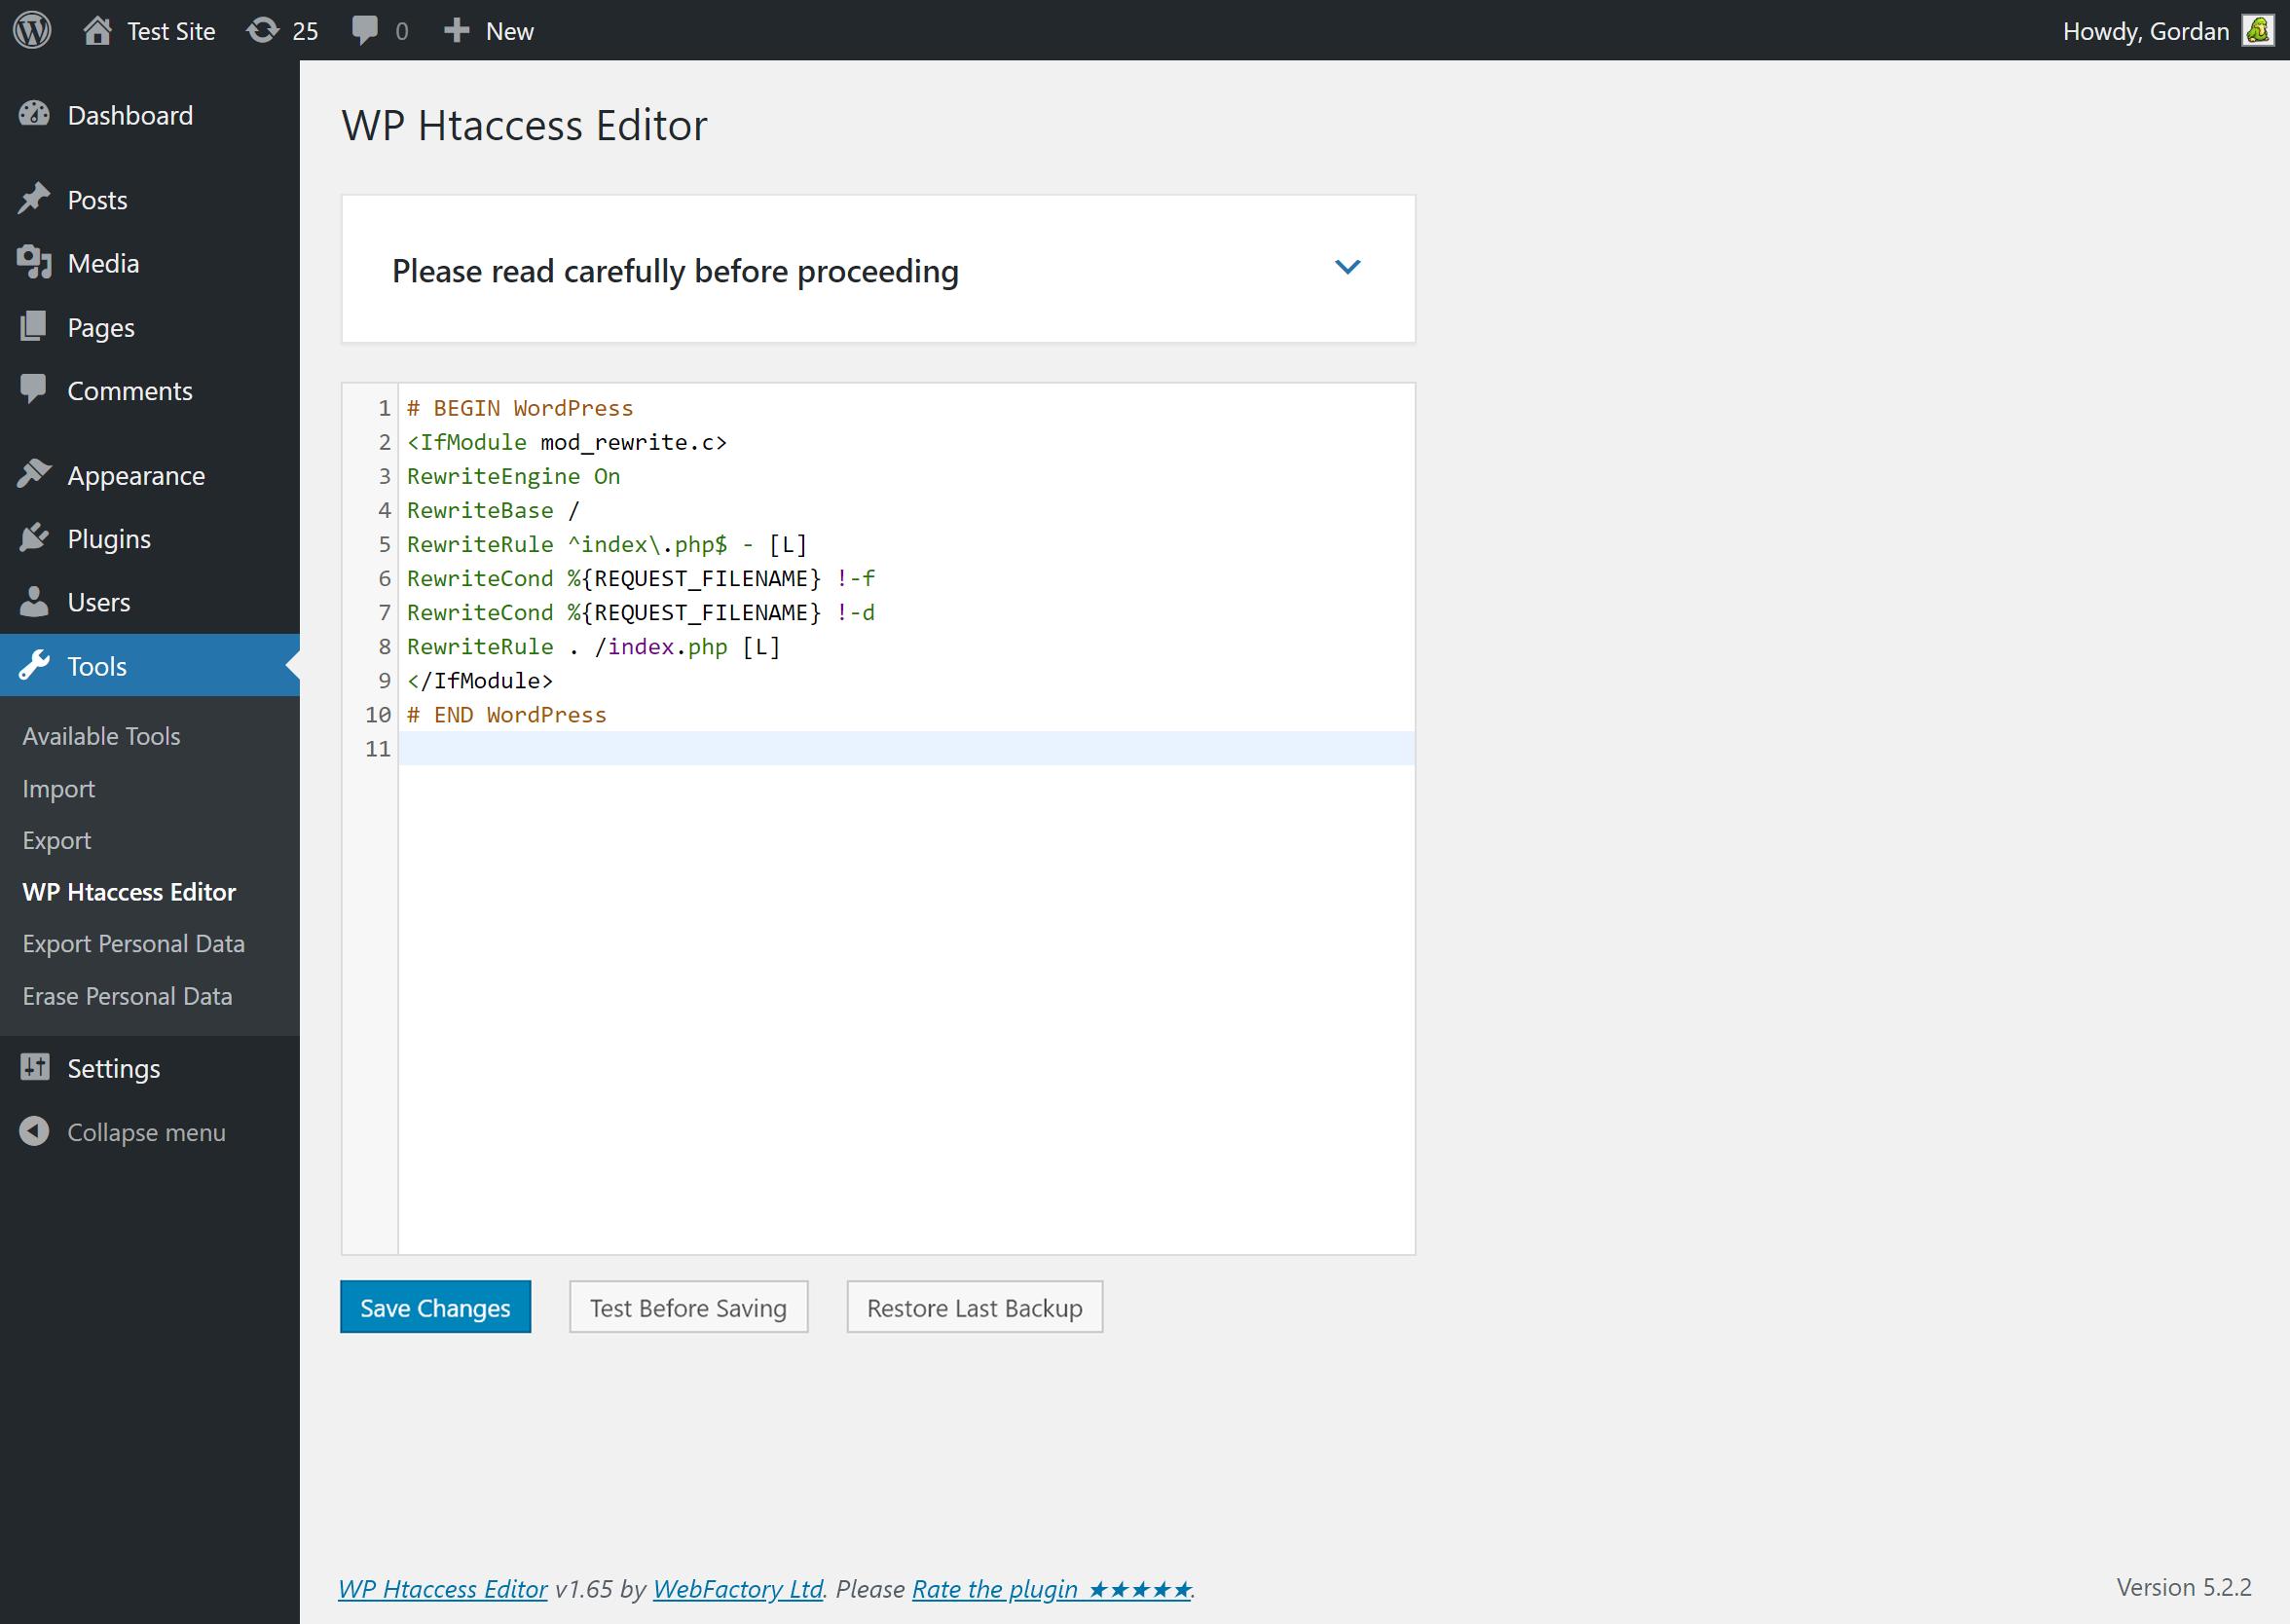 WP Htaccess Editor admin page